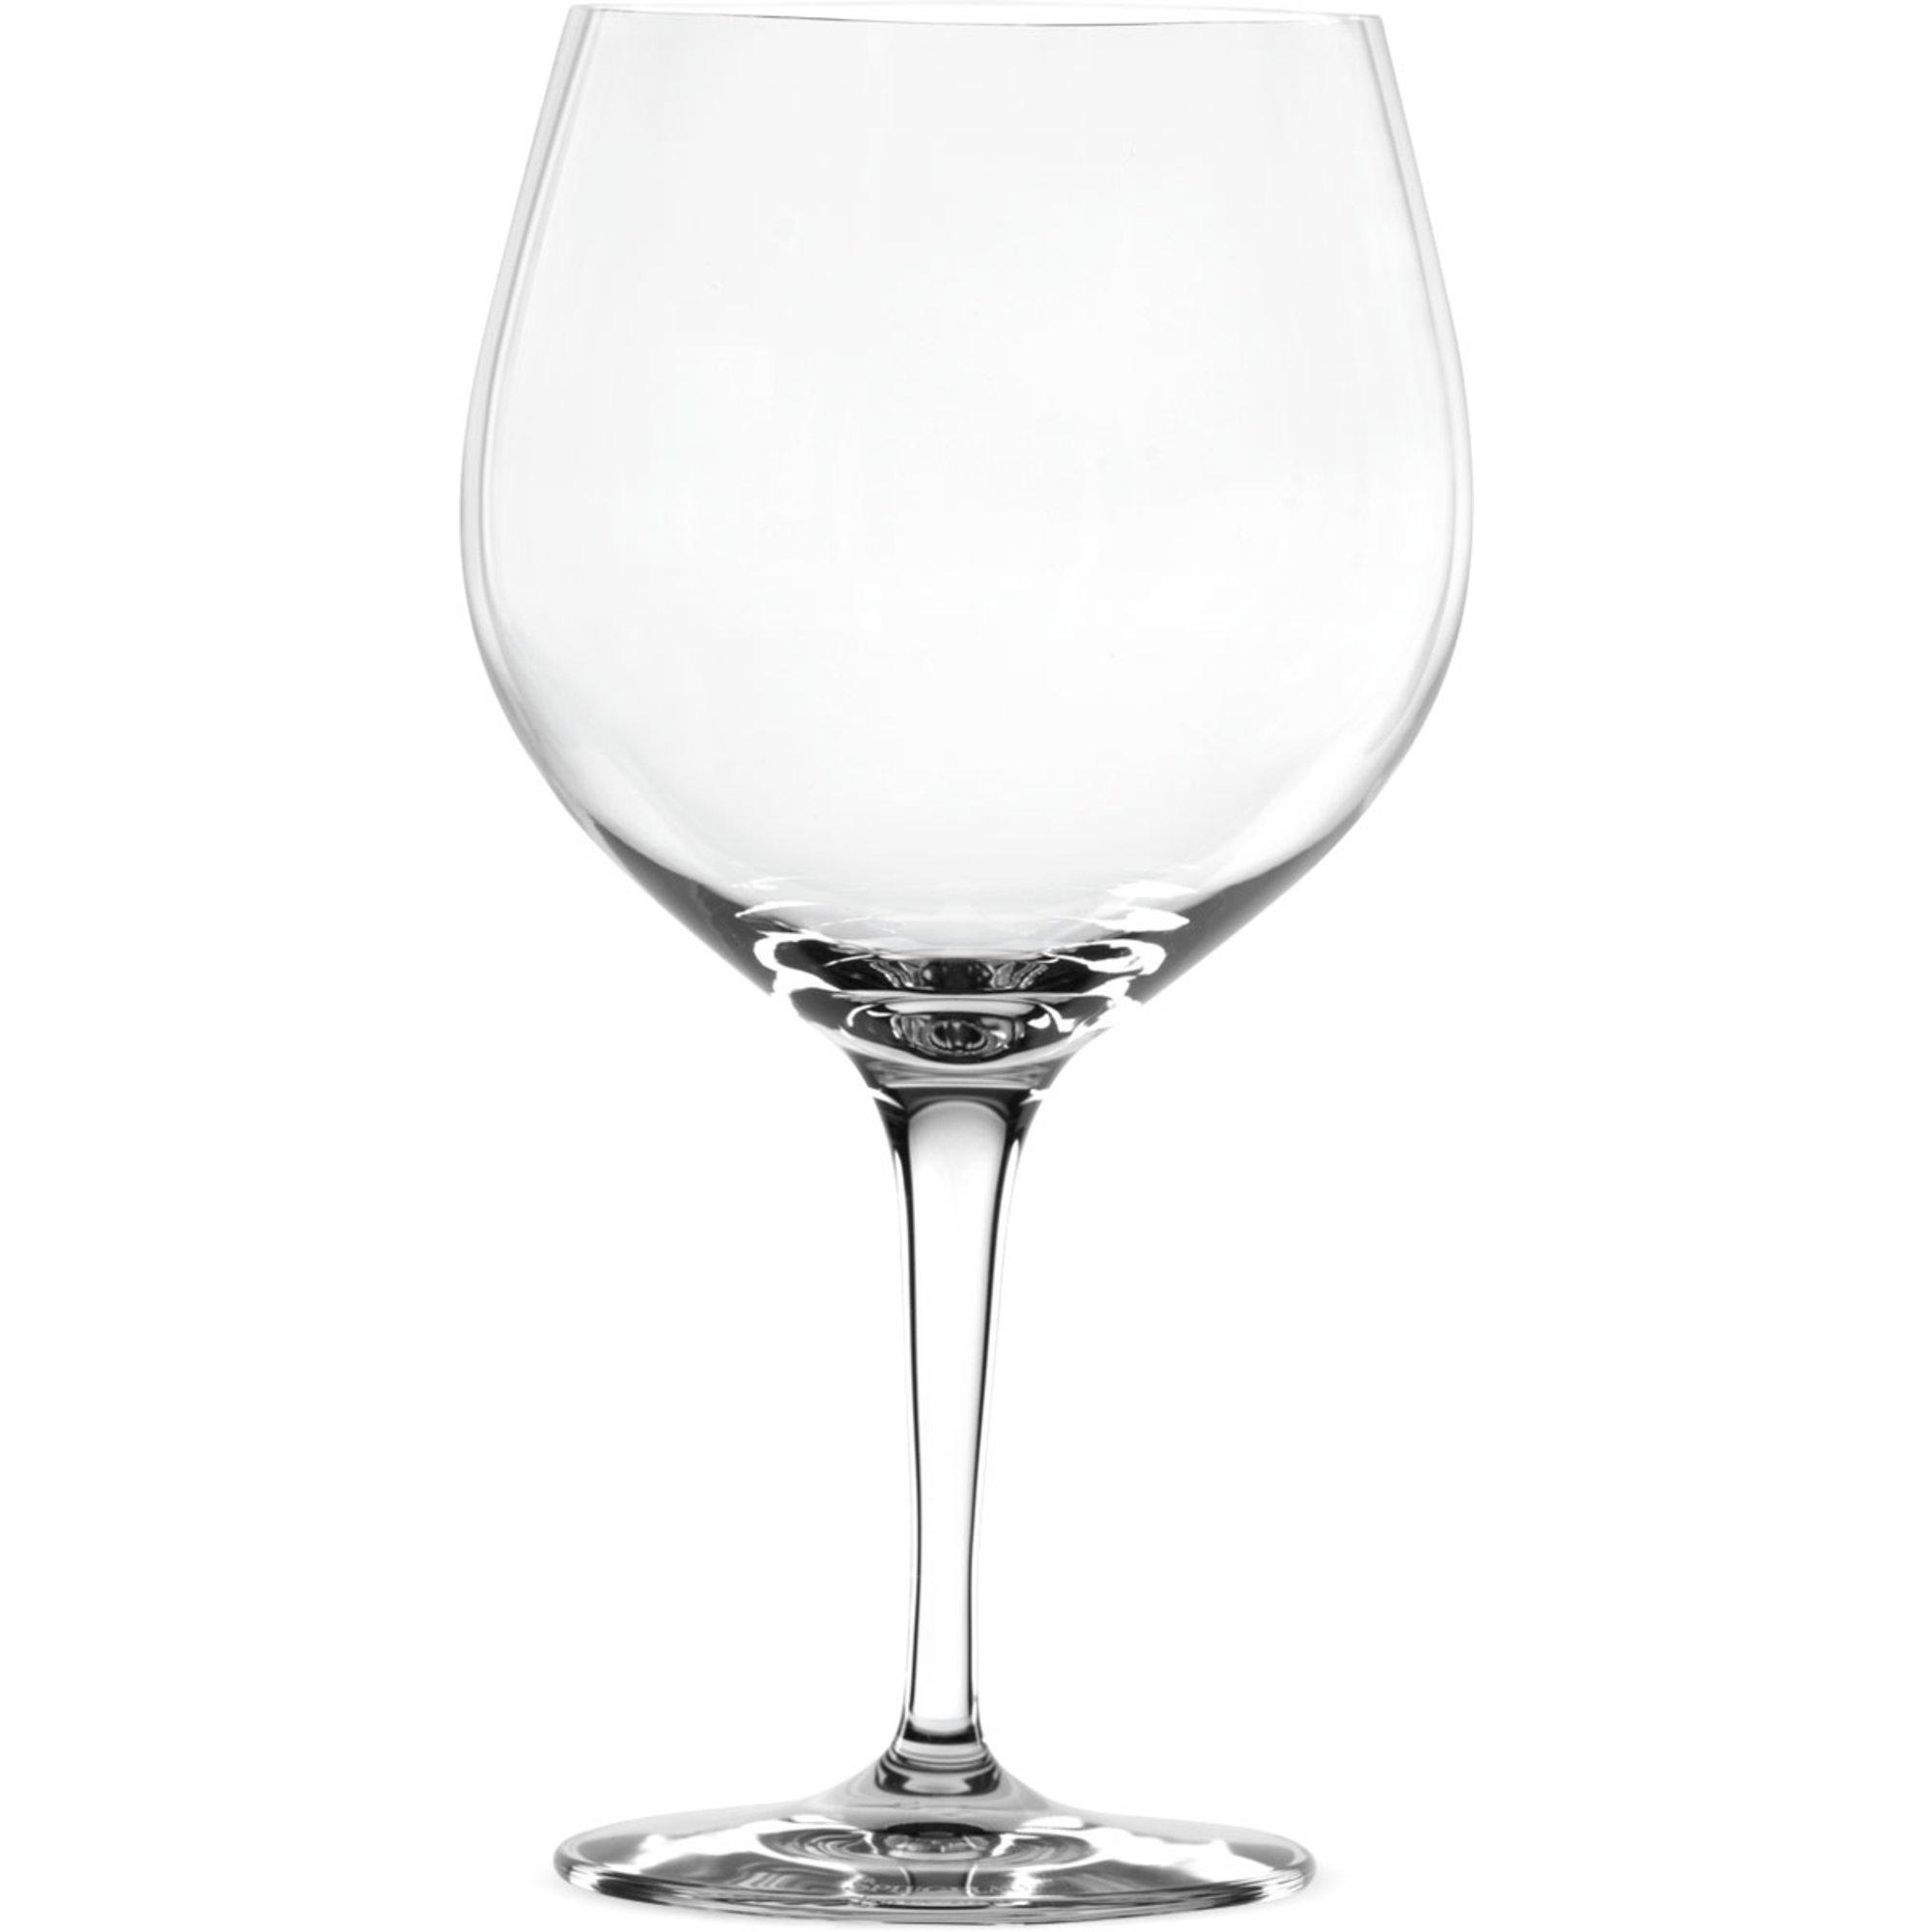 Spiegelau Gin & Tonic Glas 63 cl 6-pack